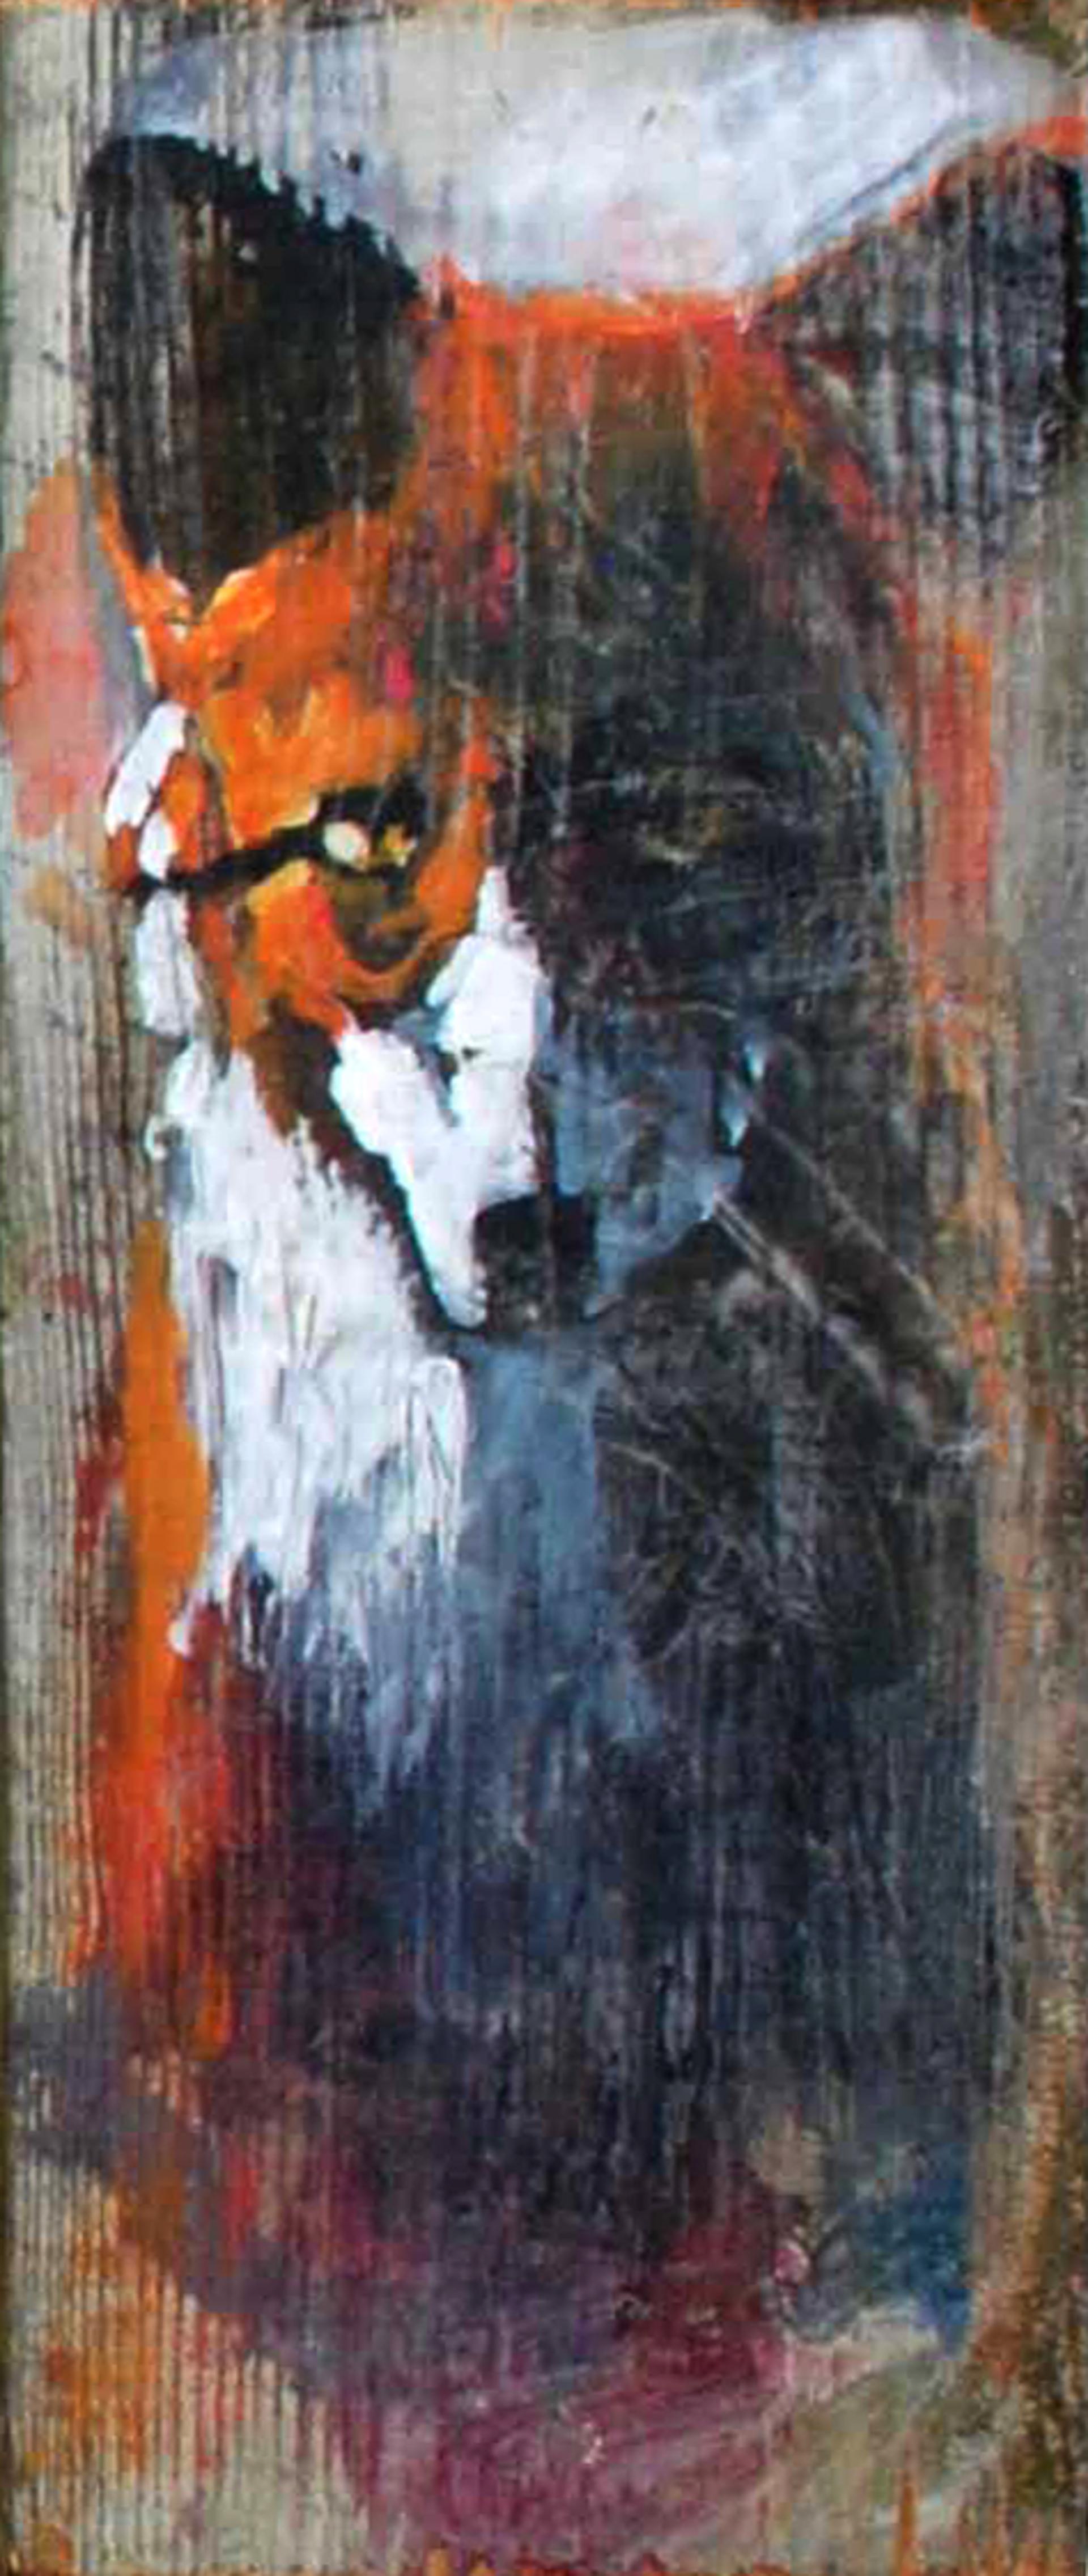 Fox #1 by Susan Easton Burns